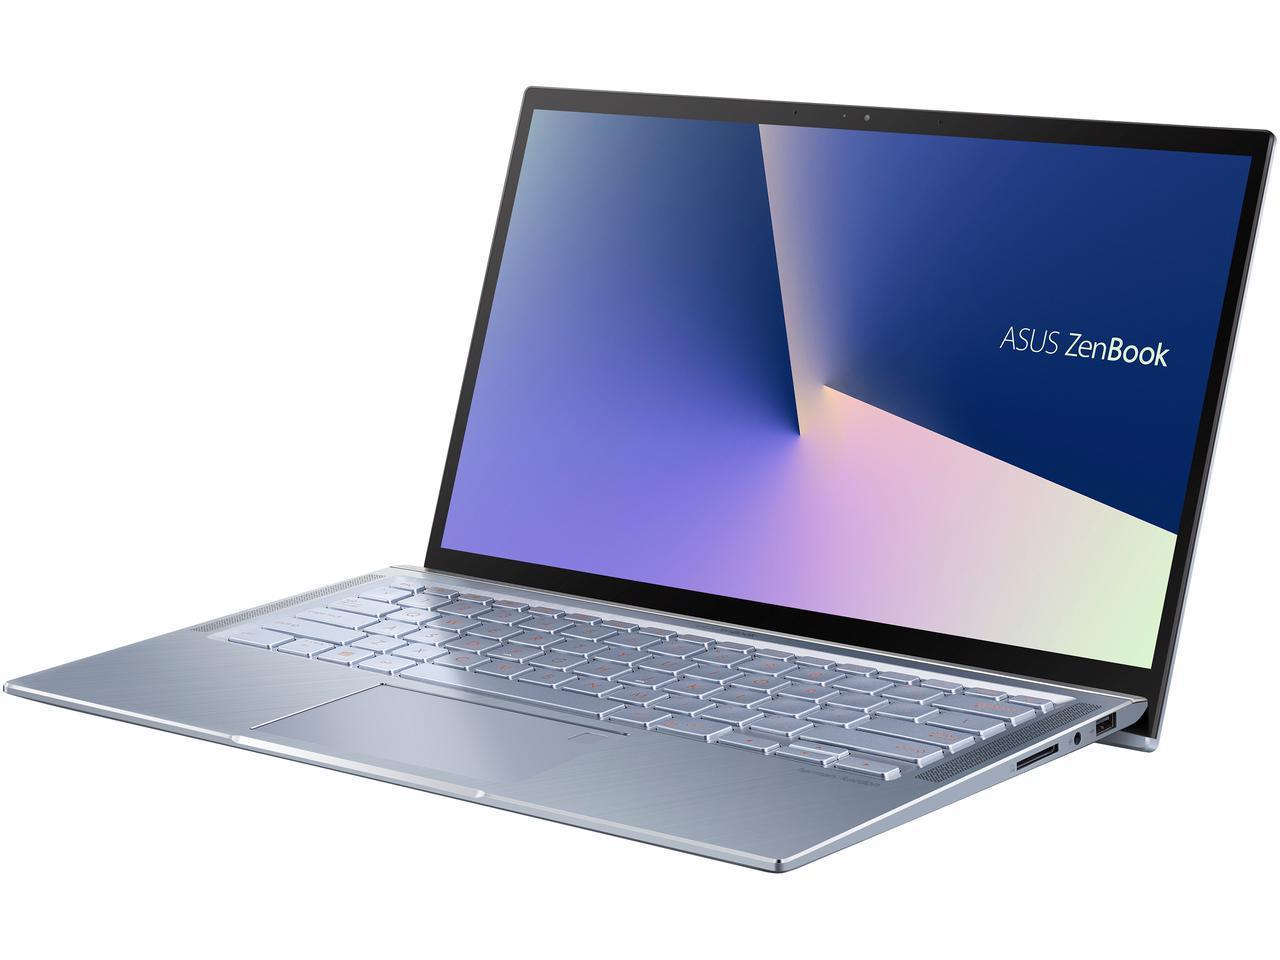 "ASUS ZenBook 14, Intel Core Whiskey Lake i5-8265U, 8 GB RAM, 256 GB NVMe PCIe SSD, NumberPad, Wi-Fi 5, Windows 10, Ultra Thin, 4-Way NanoEdge 14"" FHD, Silver Blue $679.97"